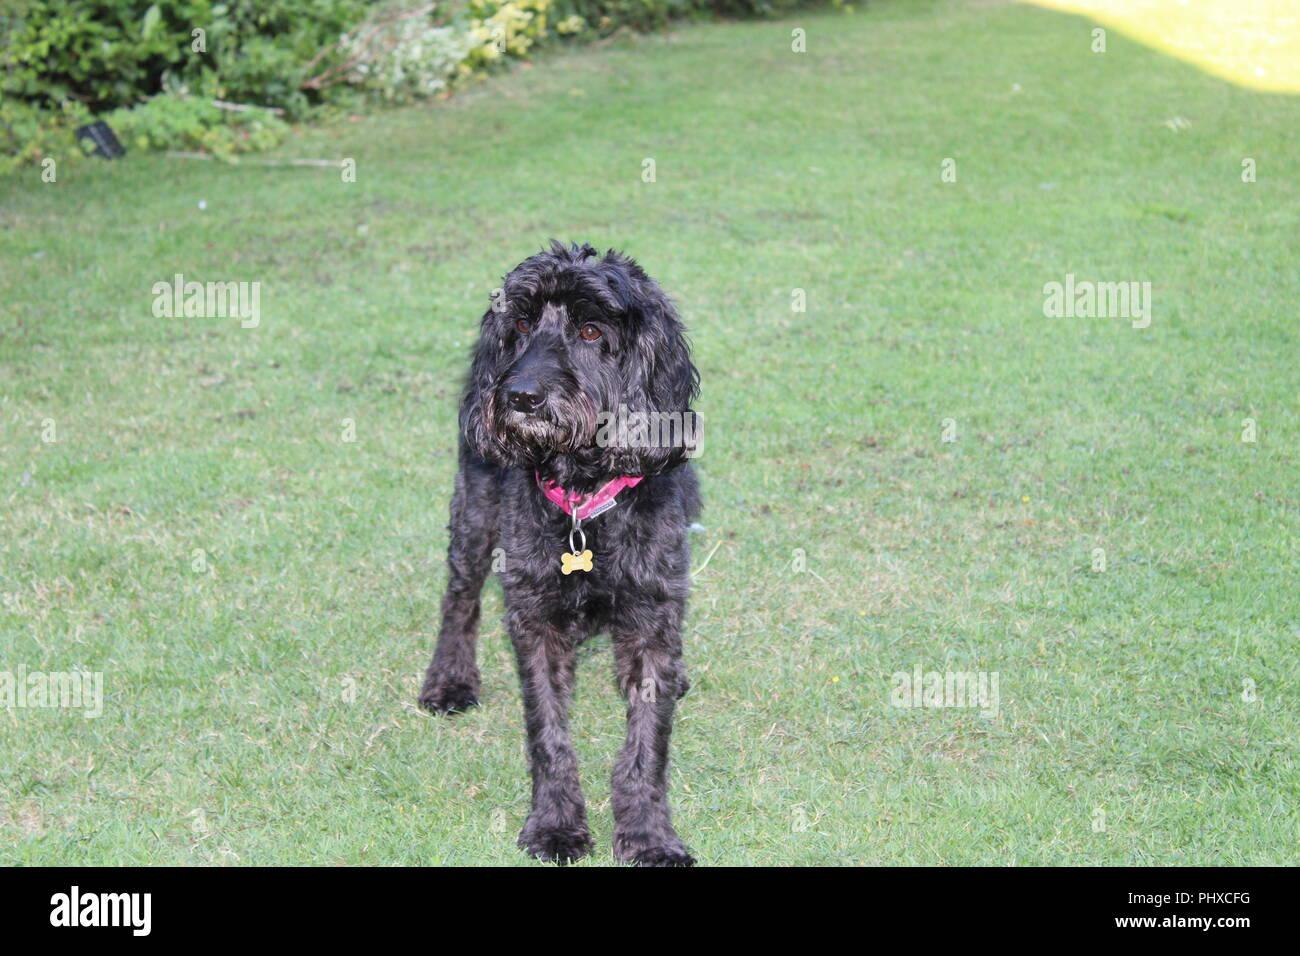 Cockapoo dog plays in garden Stock Photo